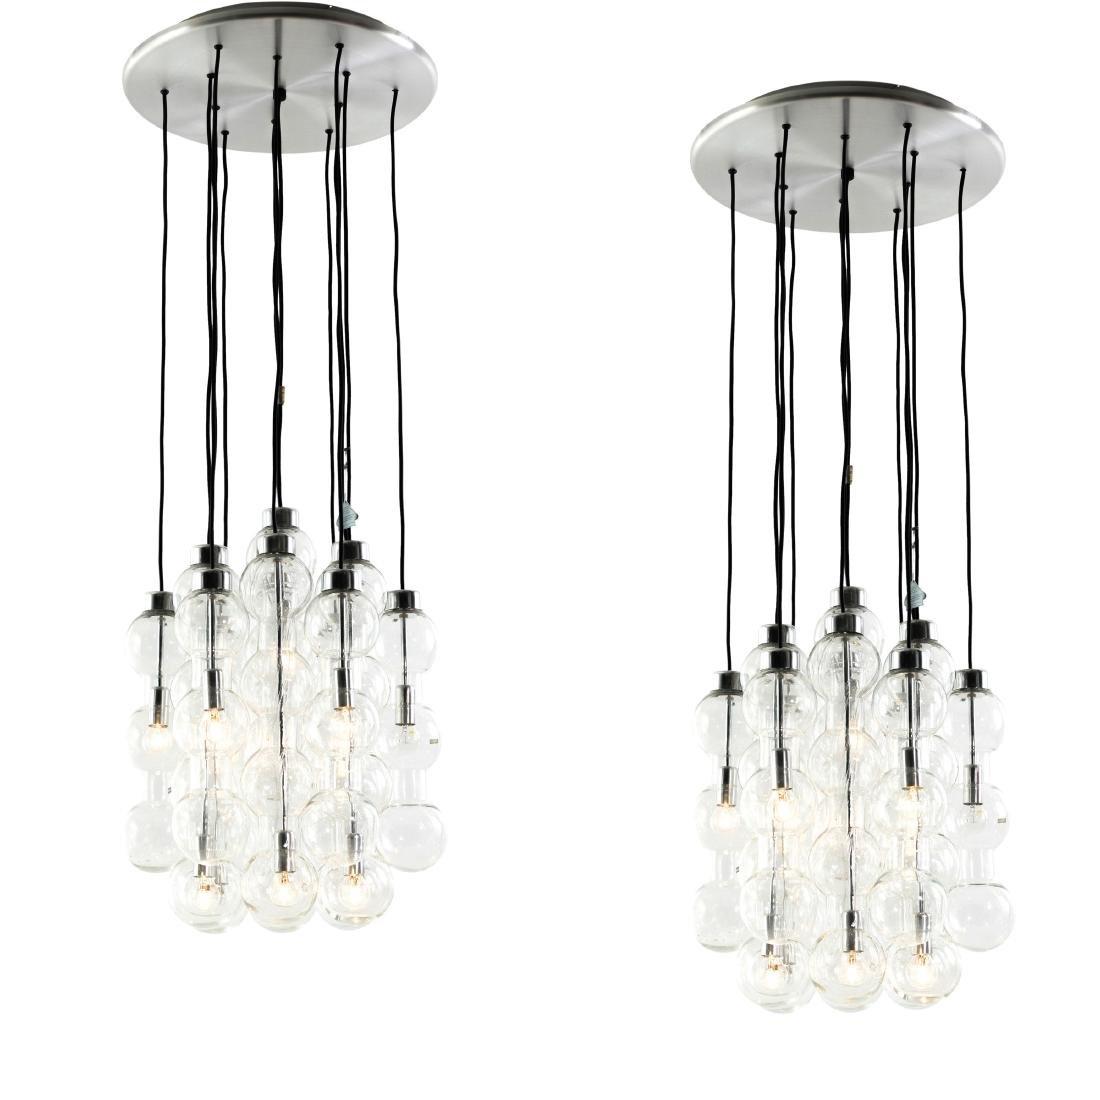 Two '4309' pendant lights, 1960s